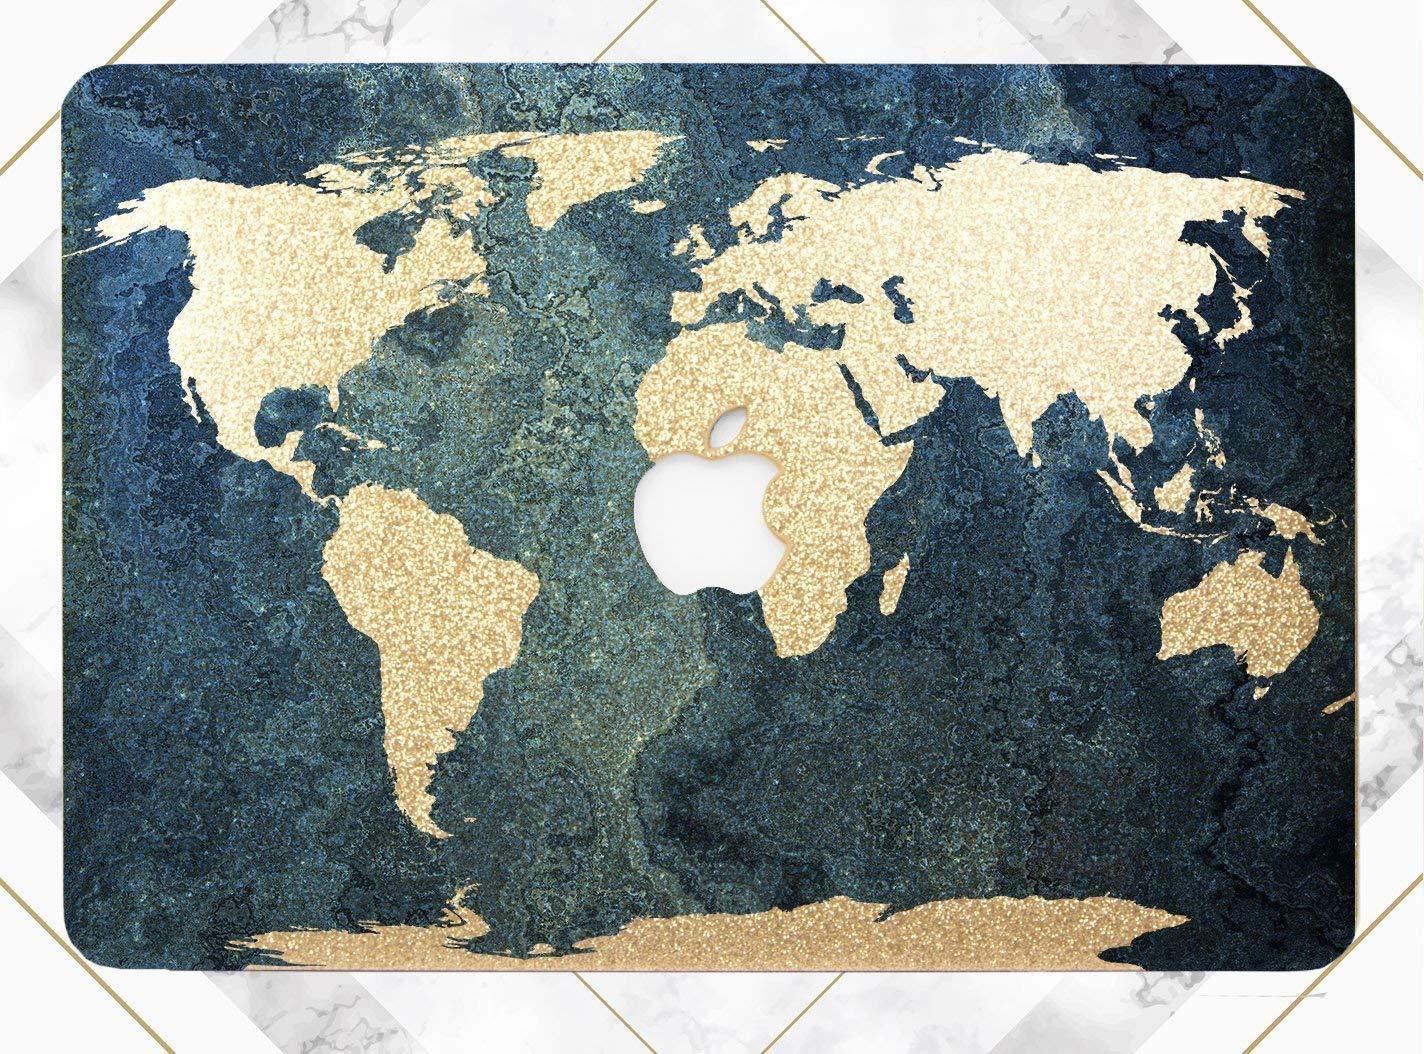 B07FF79N8N Blue Ocean World Map Gold Rose Gold Hard Plastic Glitter Case Cover For Apple Macbook Air 11 13 Macbook 12 Macbook Pro 13 15 Inch 2016 2017 2018 With Retina Display Touch Bar 81BgFoDr5GL